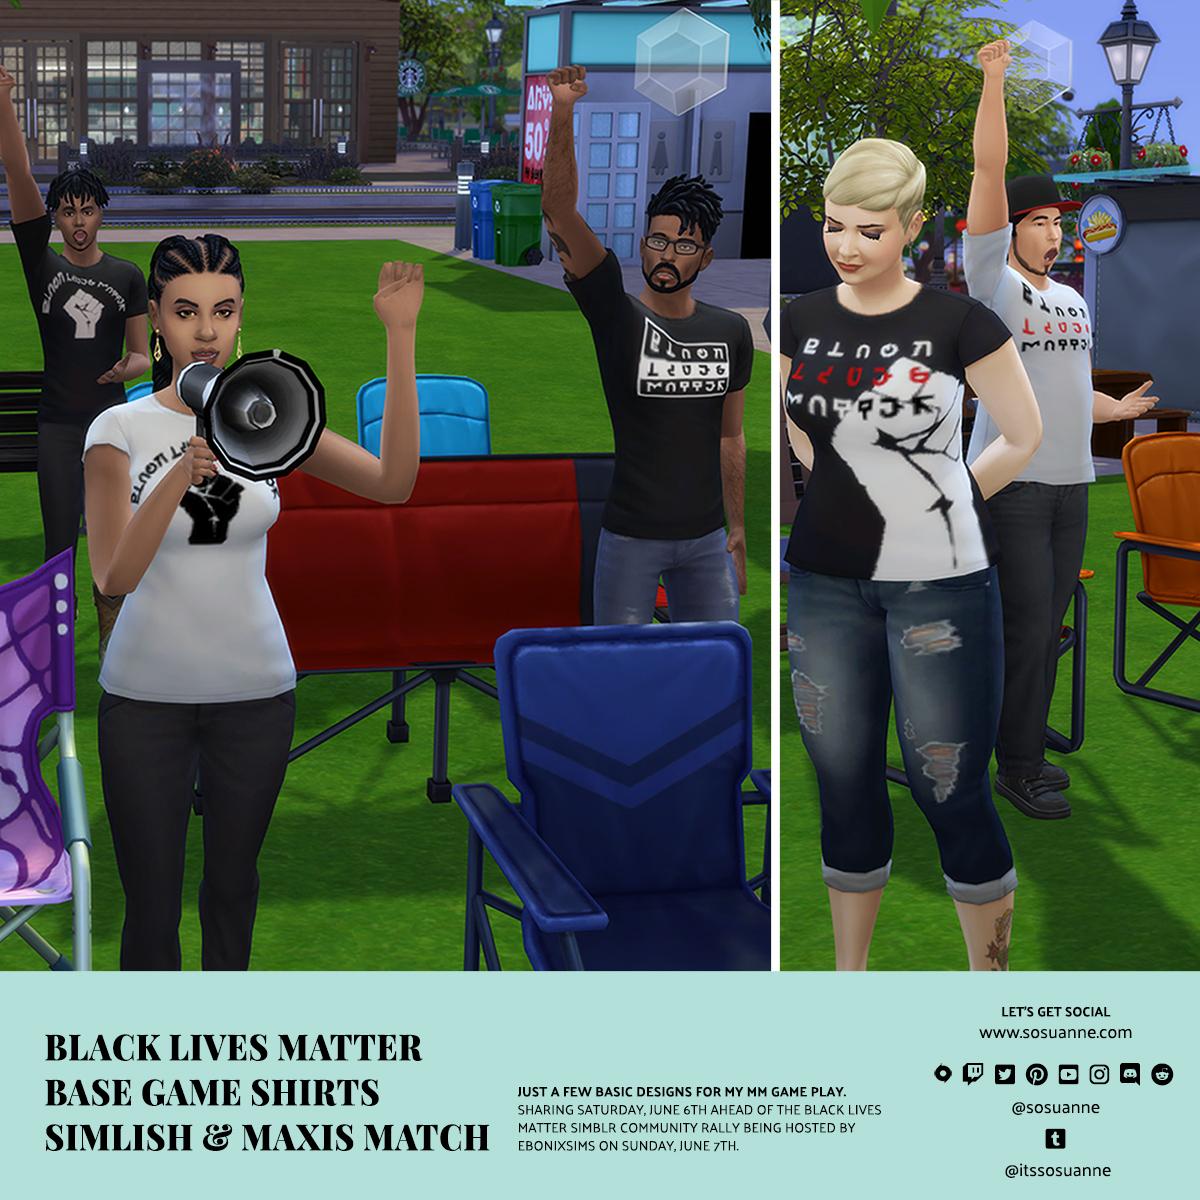 Black Lives Matter Sims 4 recolor shirts